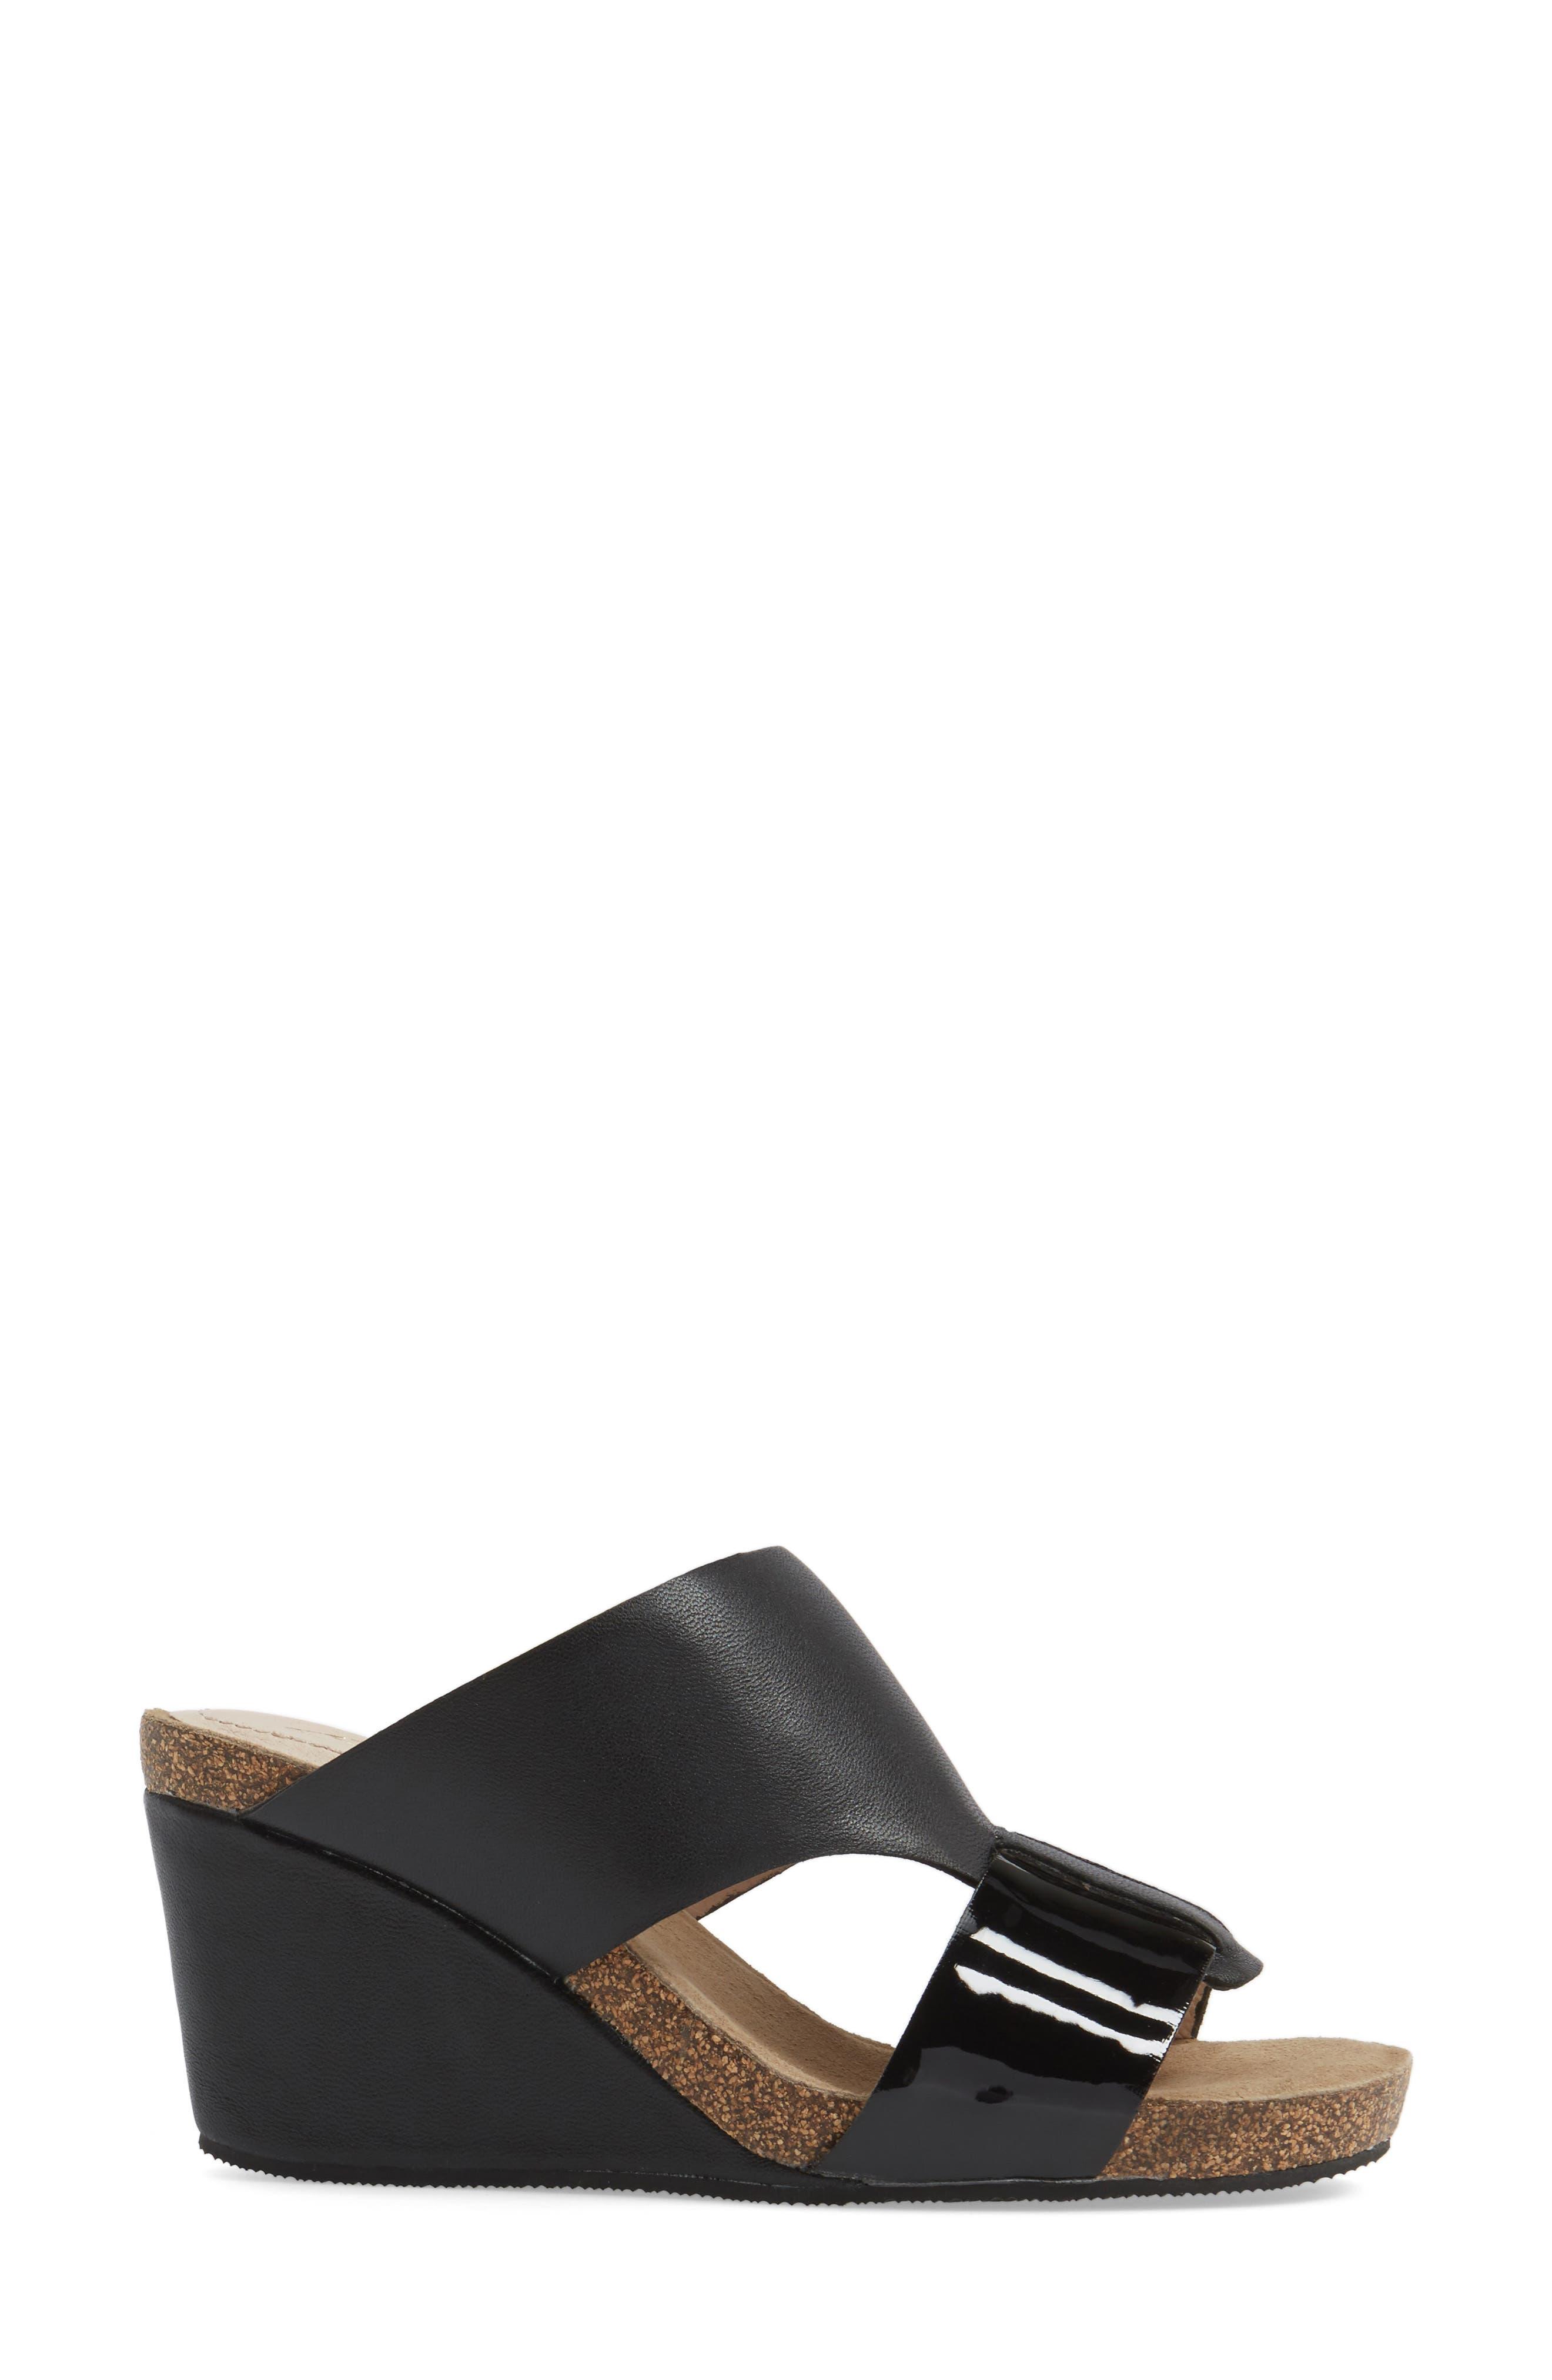 Berta Wedge Sandal,                             Alternate thumbnail 3, color,                             Black Leather